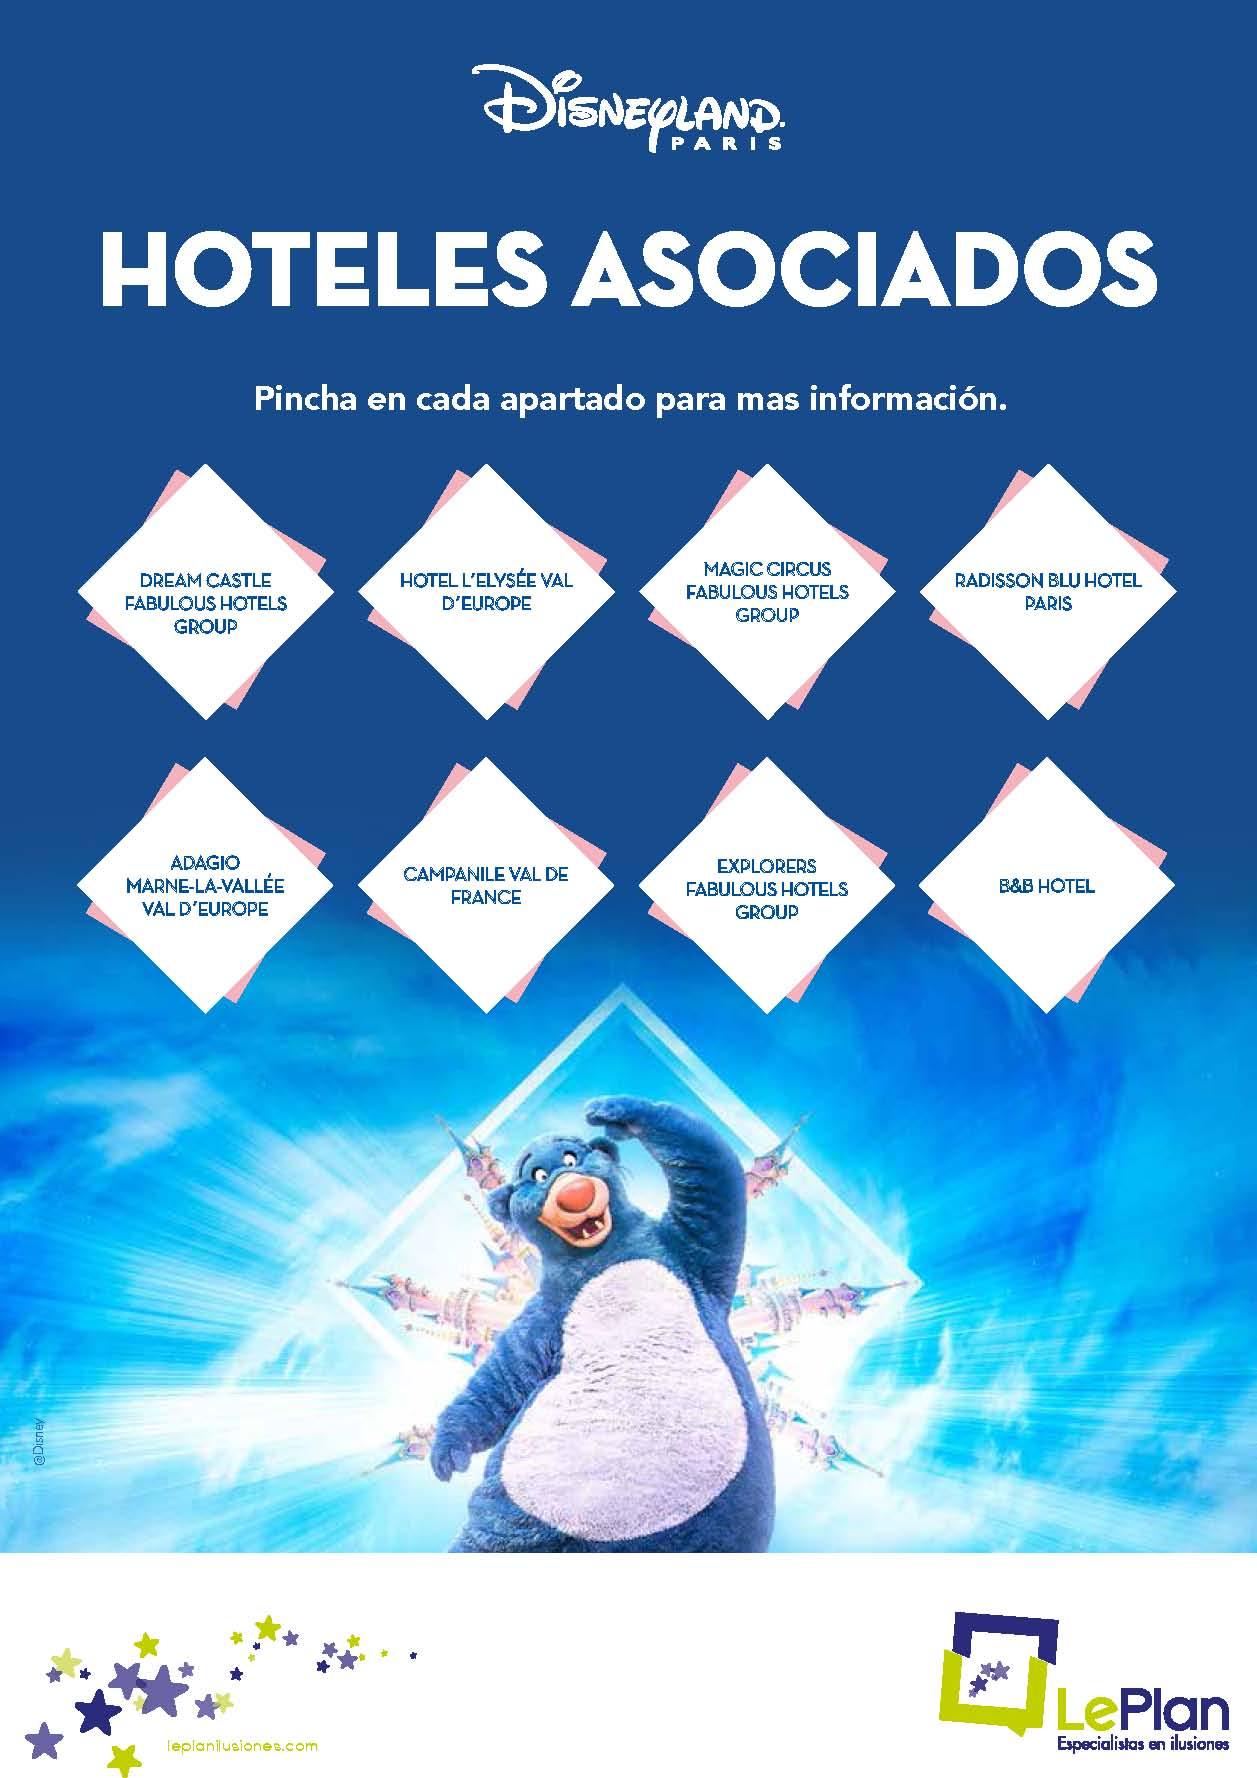 Fichas Tecnicas hoteles asociados Disneyland Paris 2021